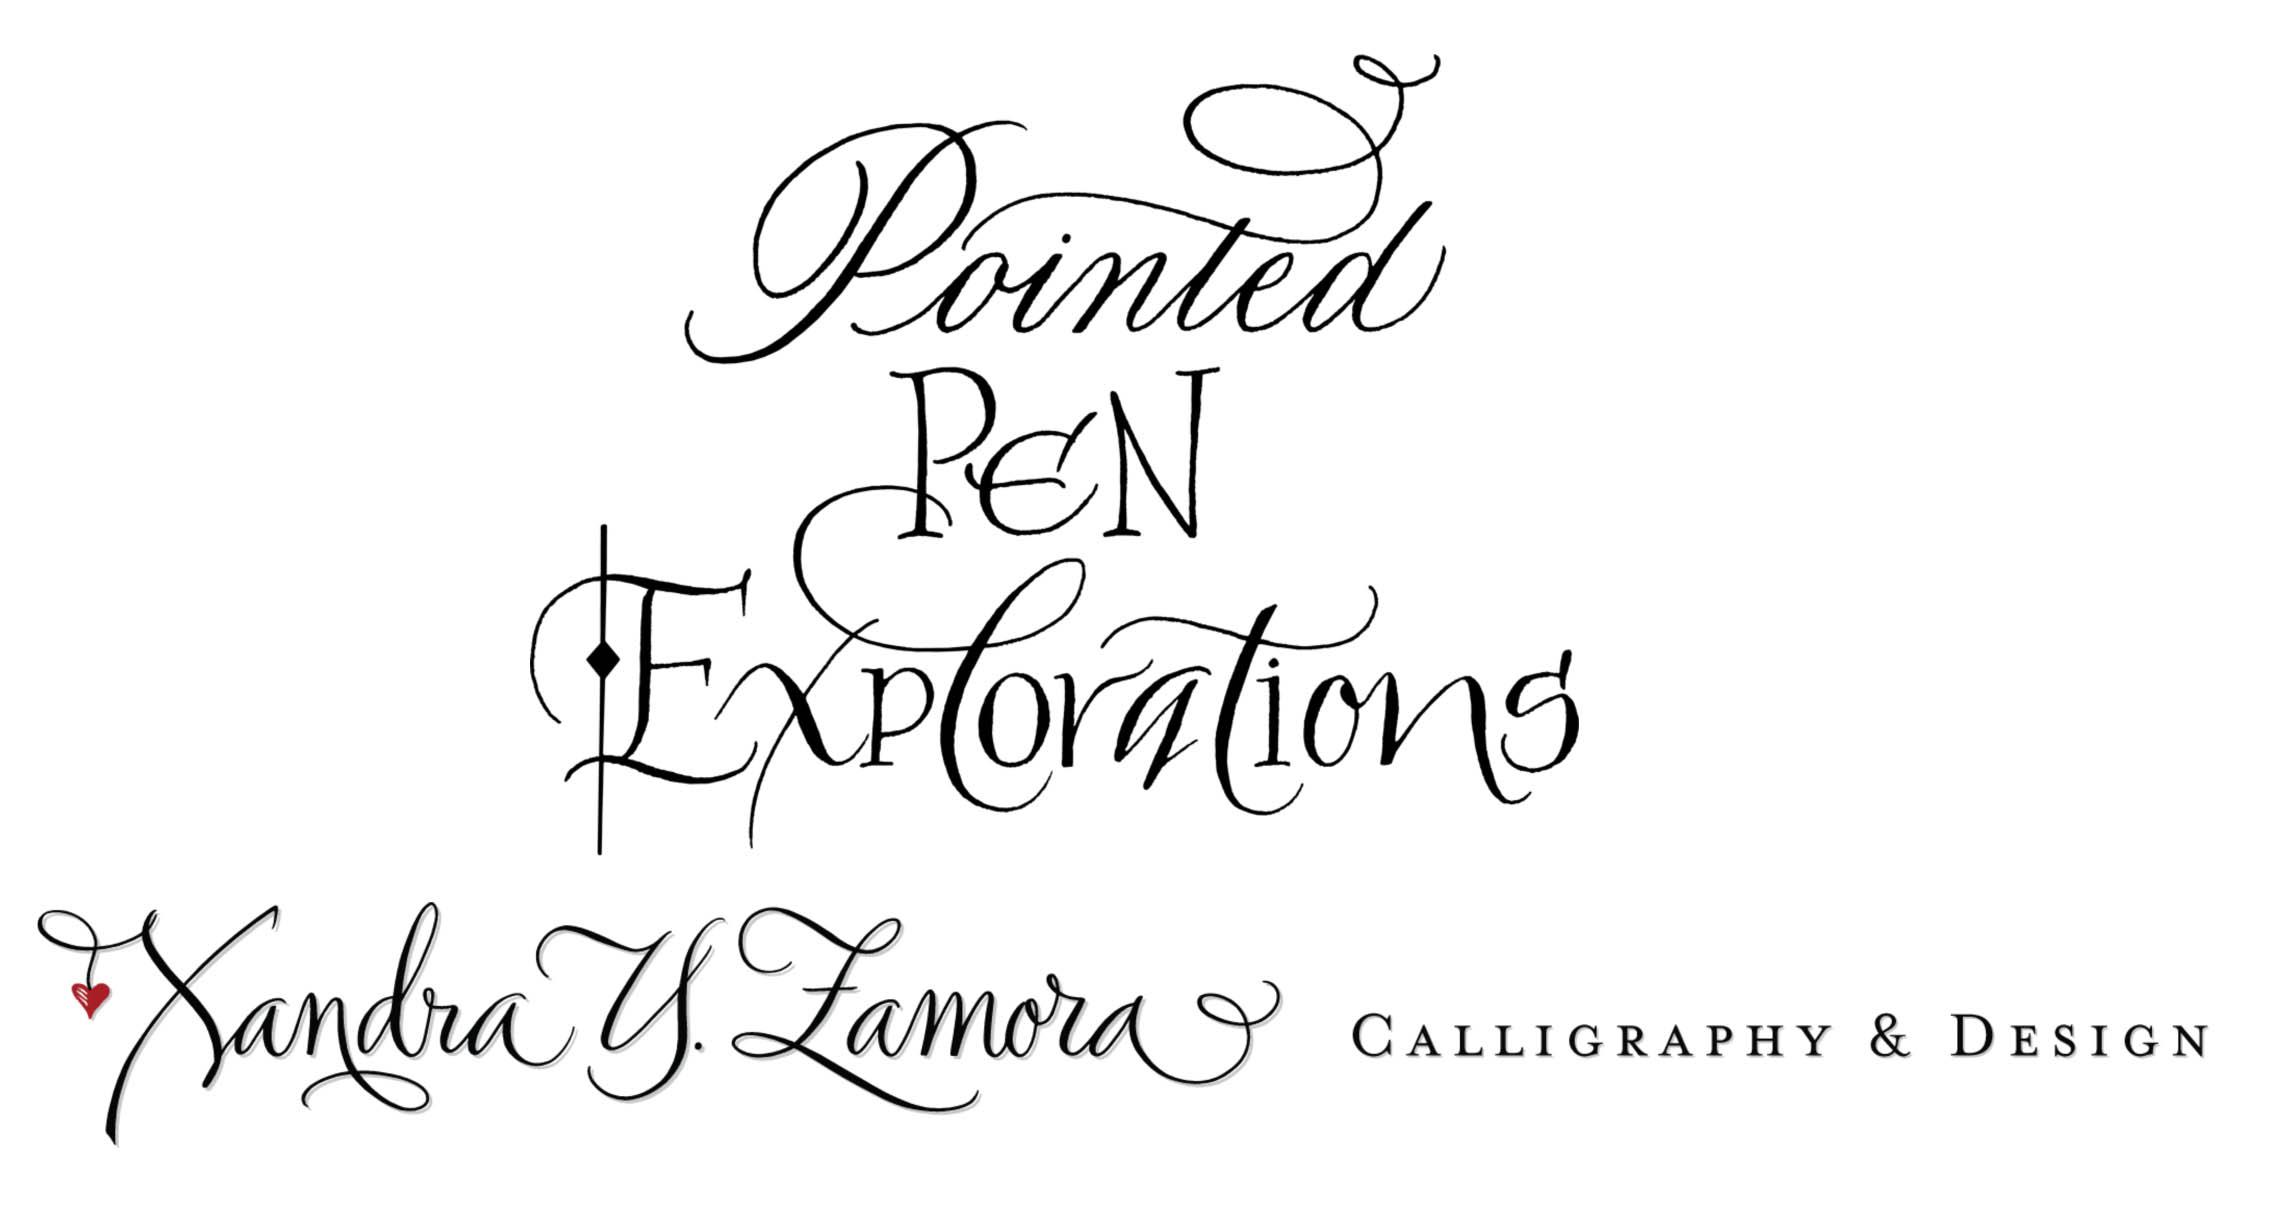 Calligraphy Workshop Lettering Art Studio